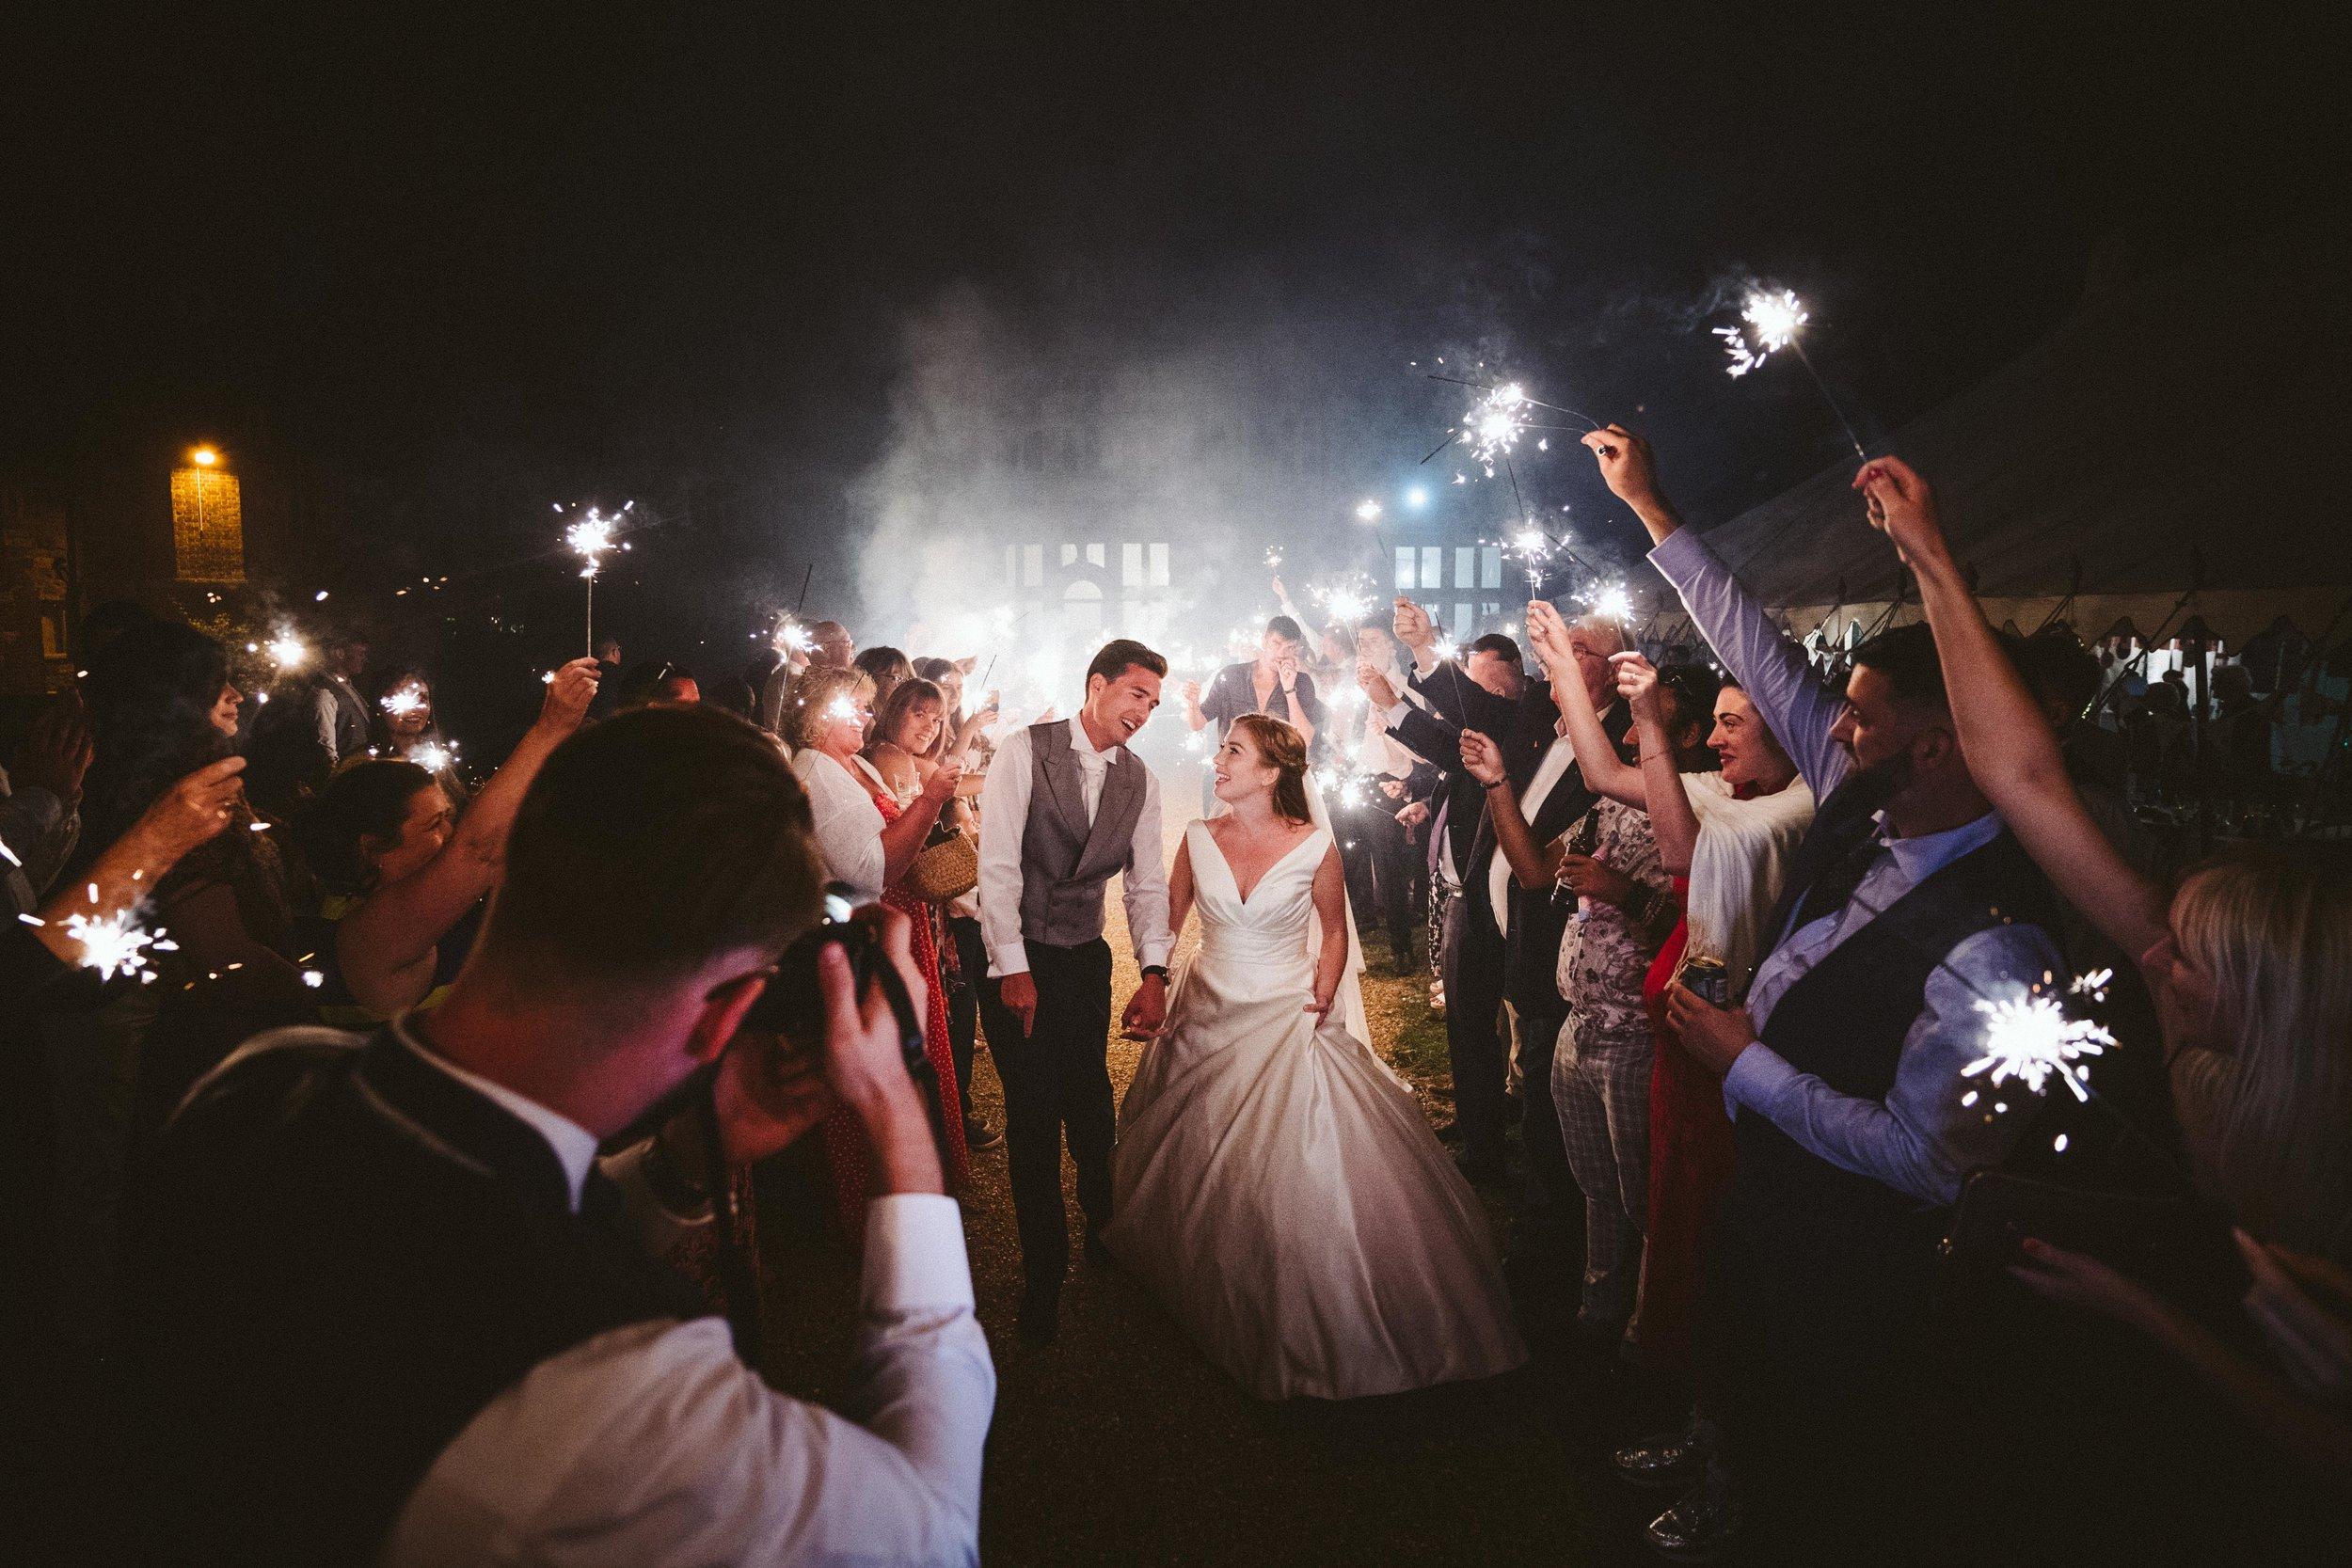 kent-wedding-photographer-100494.jpg